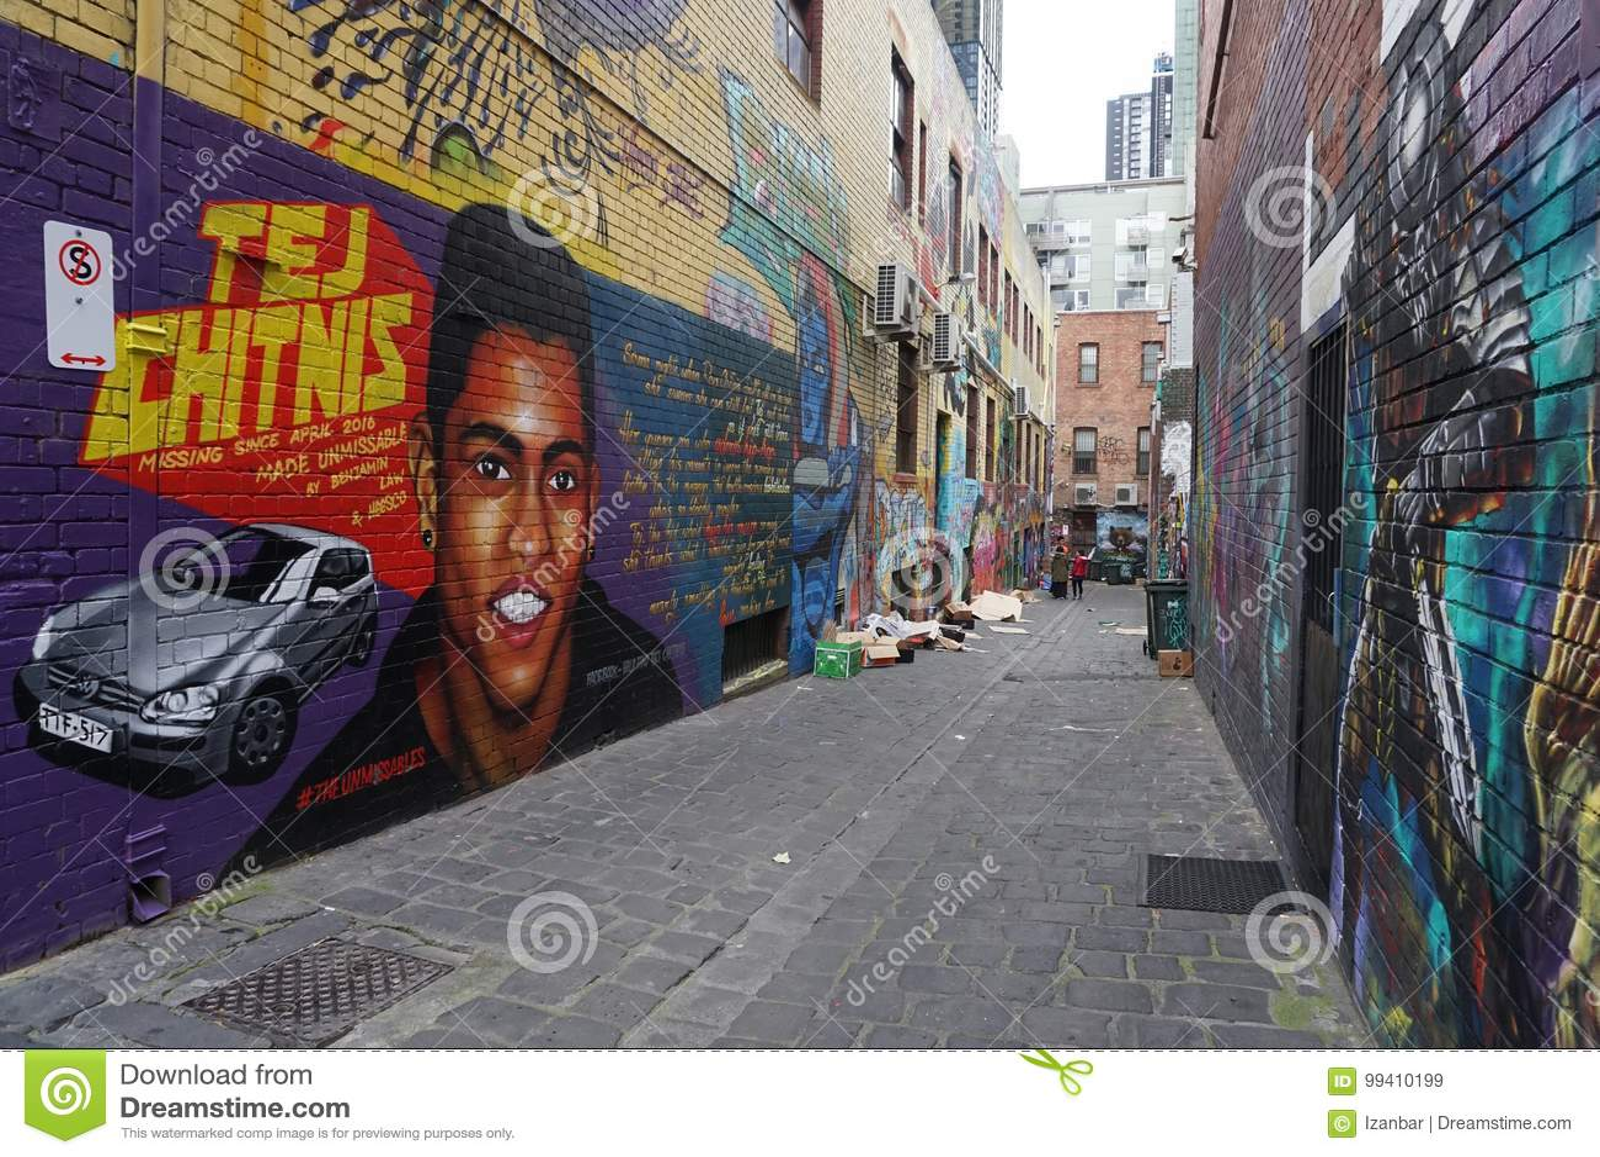 MELBOURNE, AUSTRALIË - AUGUSTUS 15 2017 - Muurschilderijengraffiti murales op stadsstraten